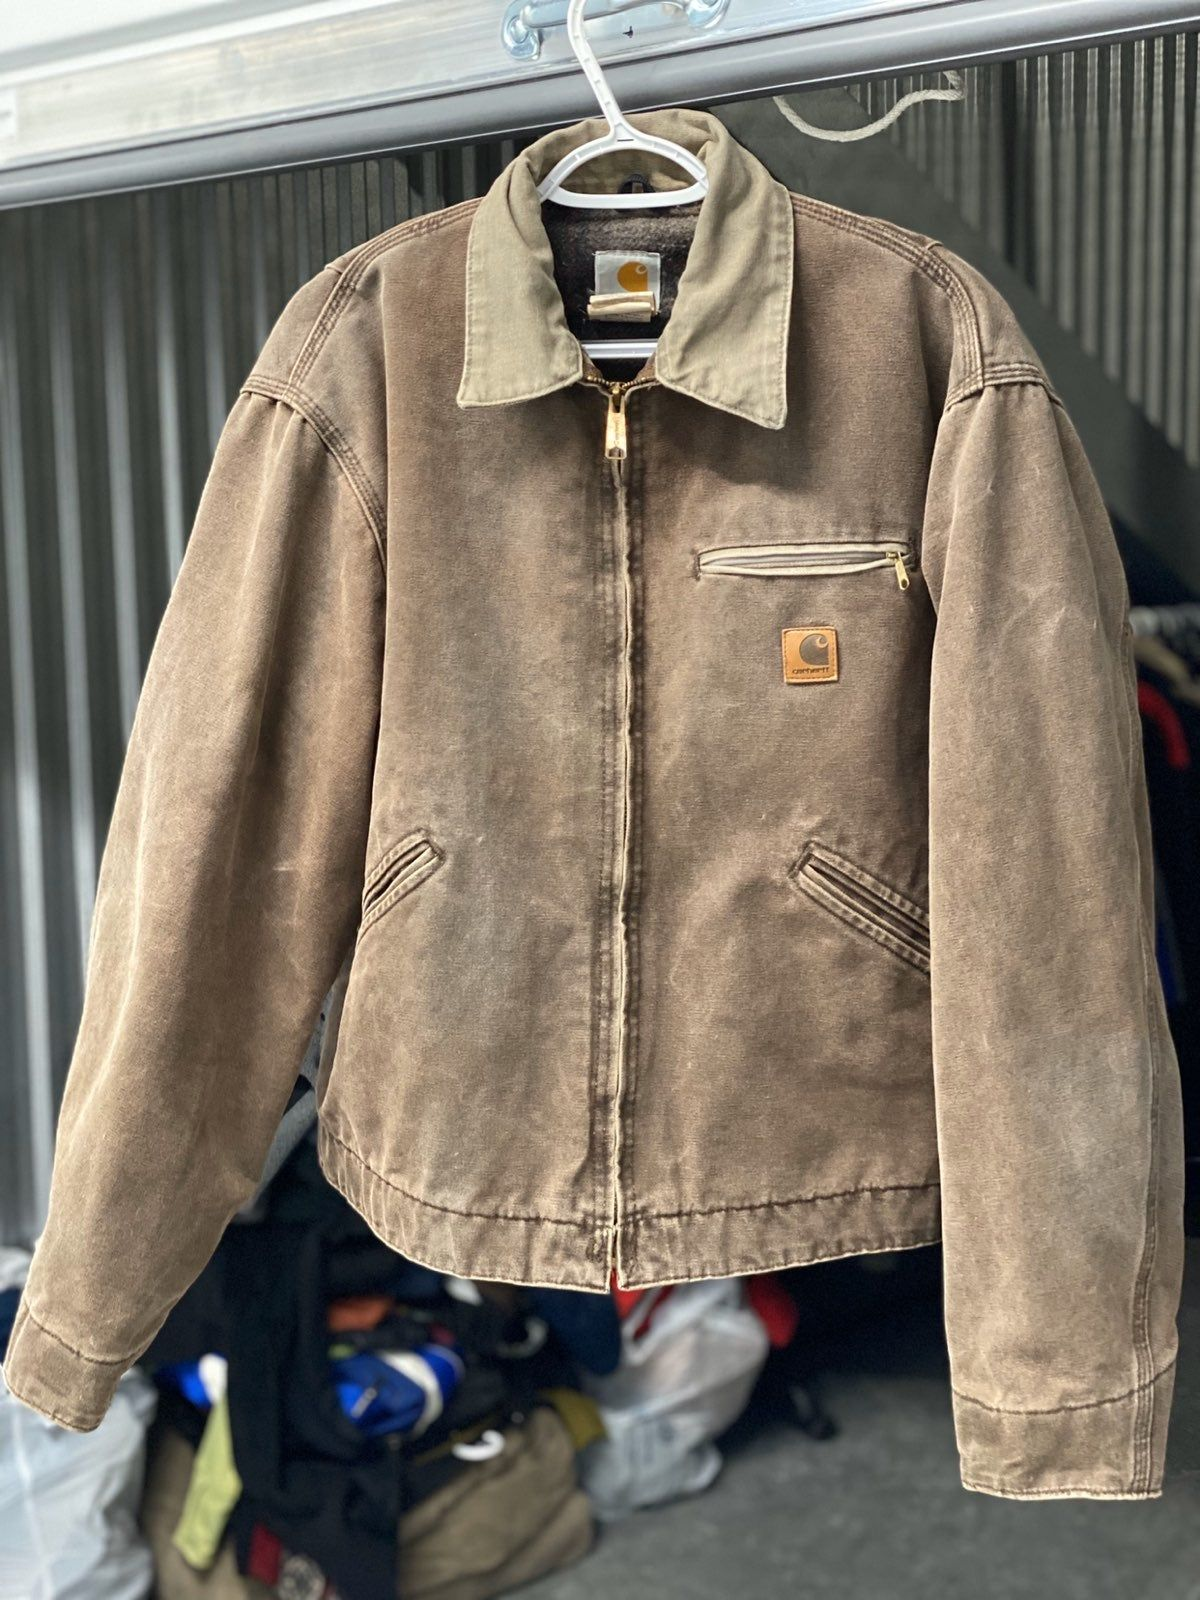 Vintage Carhartt Jacket In 2021 Carhartt Jacket Vintage Jacket Workwear Vintage [ 1600 x 1200 Pixel ]